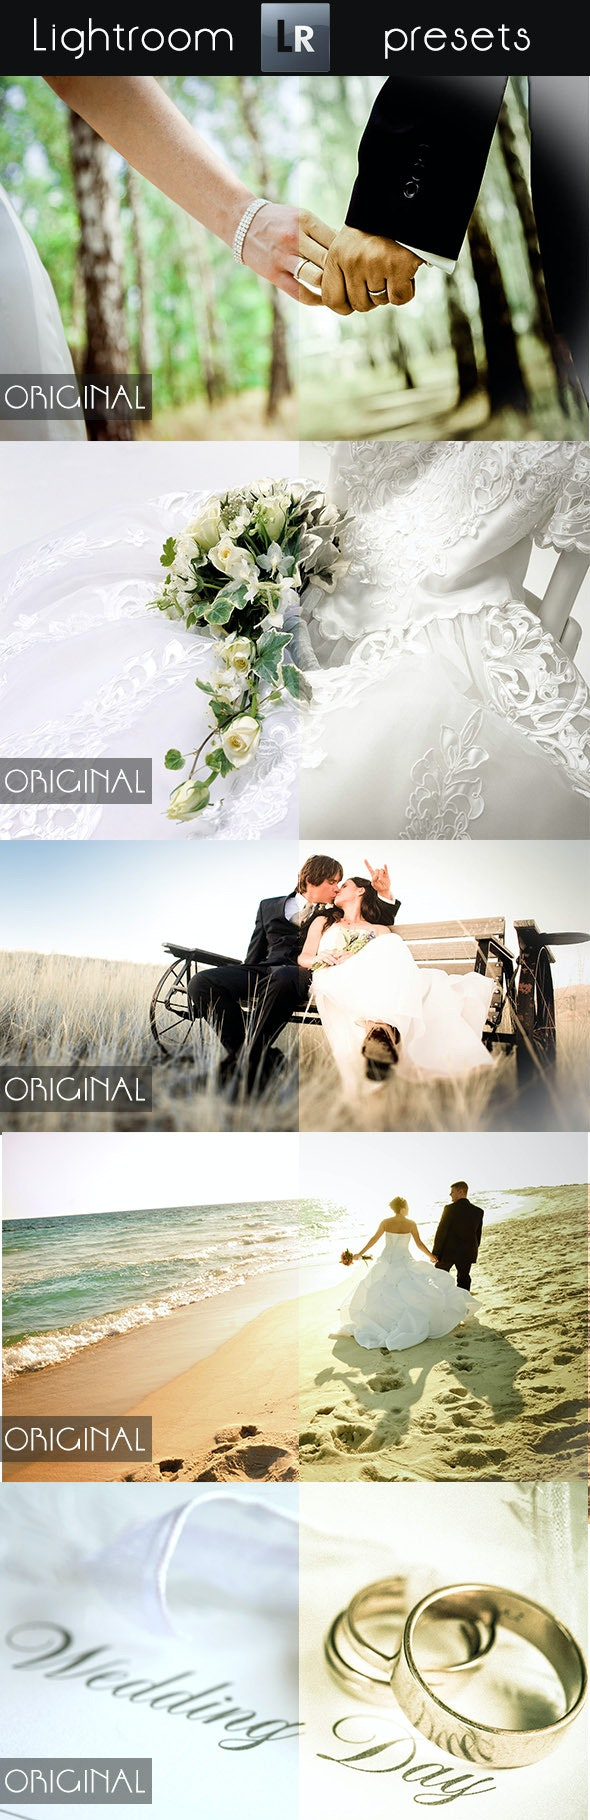 10 Wedding Pro Presets - Wedding Lightroom Presets